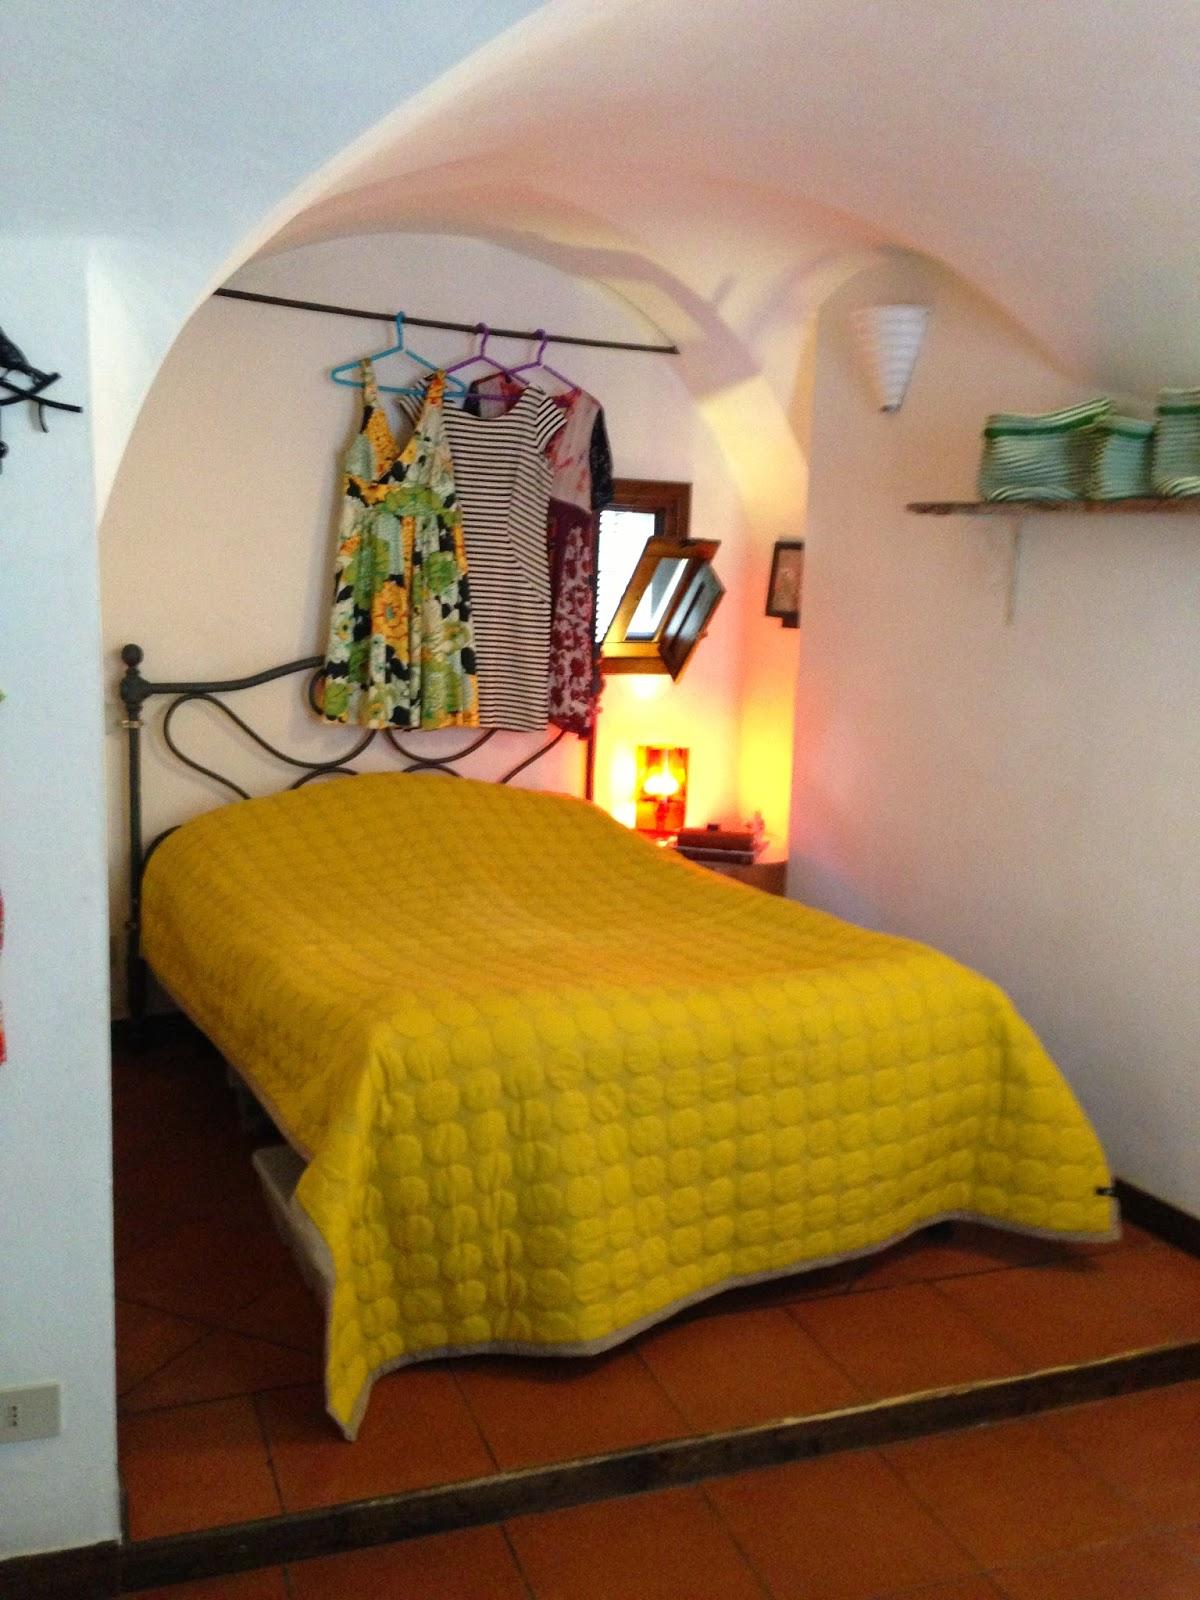 Lejlighed i Pigna, Italien: Lejligheden